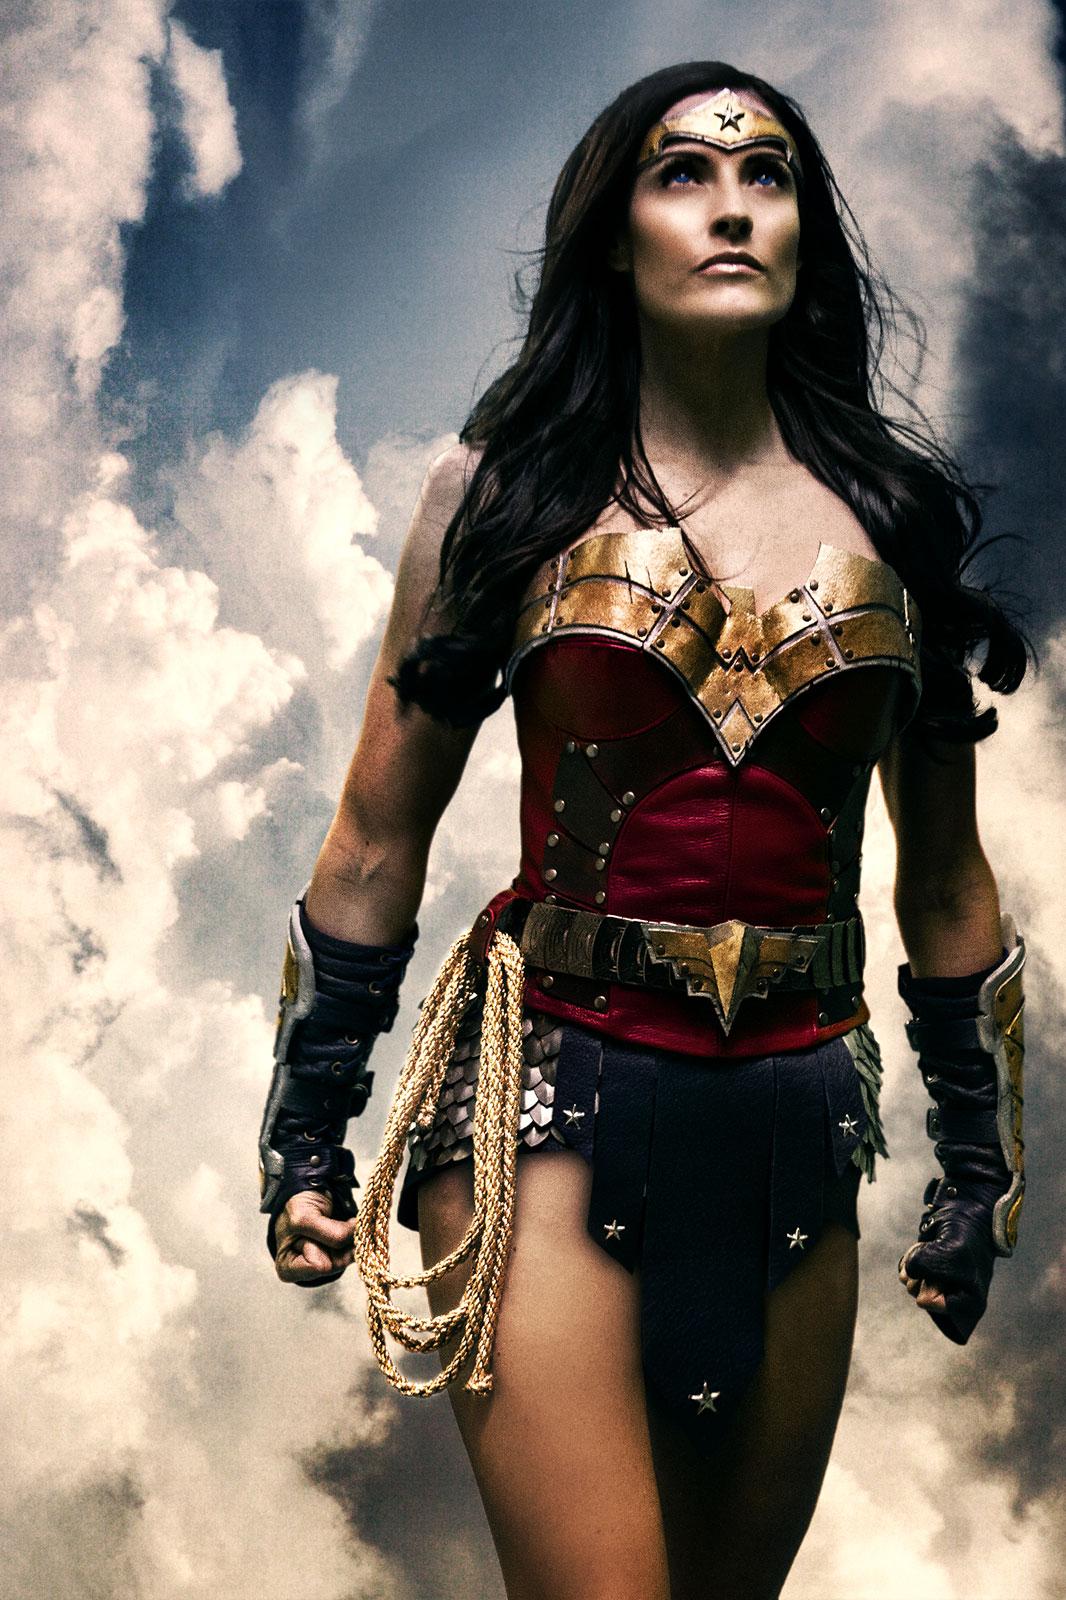 Rileah Vanderbilt  is Wonder Woman — Photo by  Rainfall Films